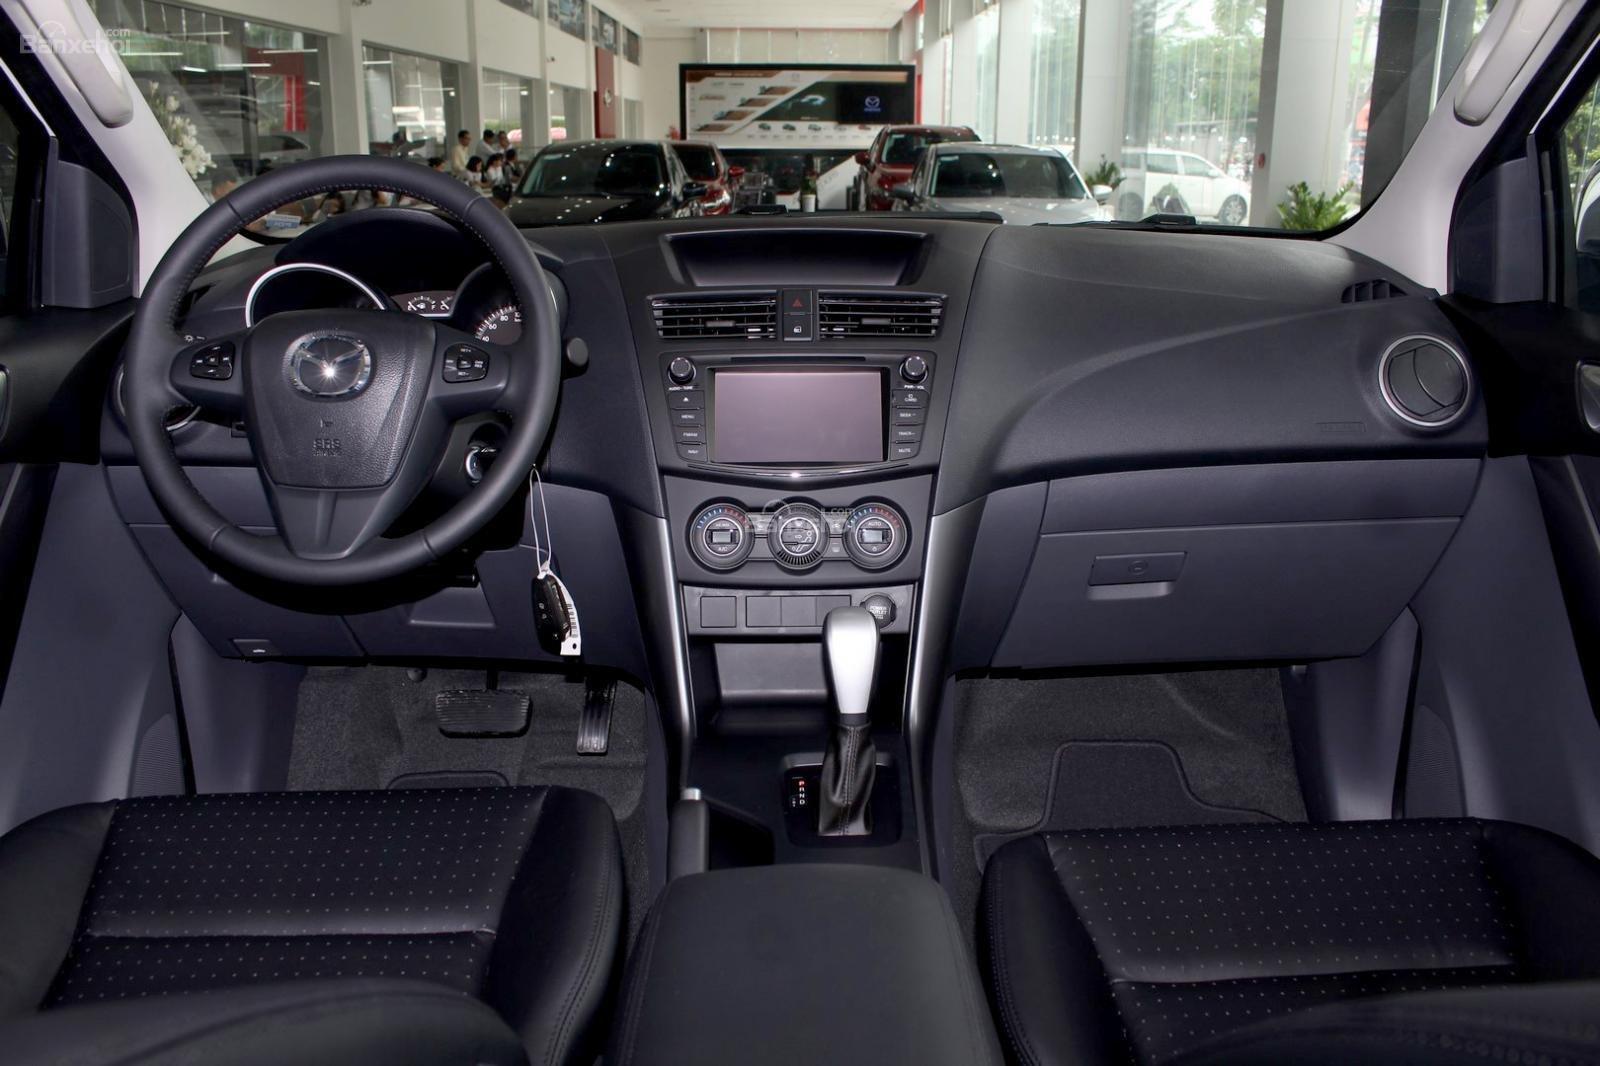 Bán Mazda BT 50 2019 số sàn MT, LH 0941.322.979 tại Mazda Bình Triệu-3